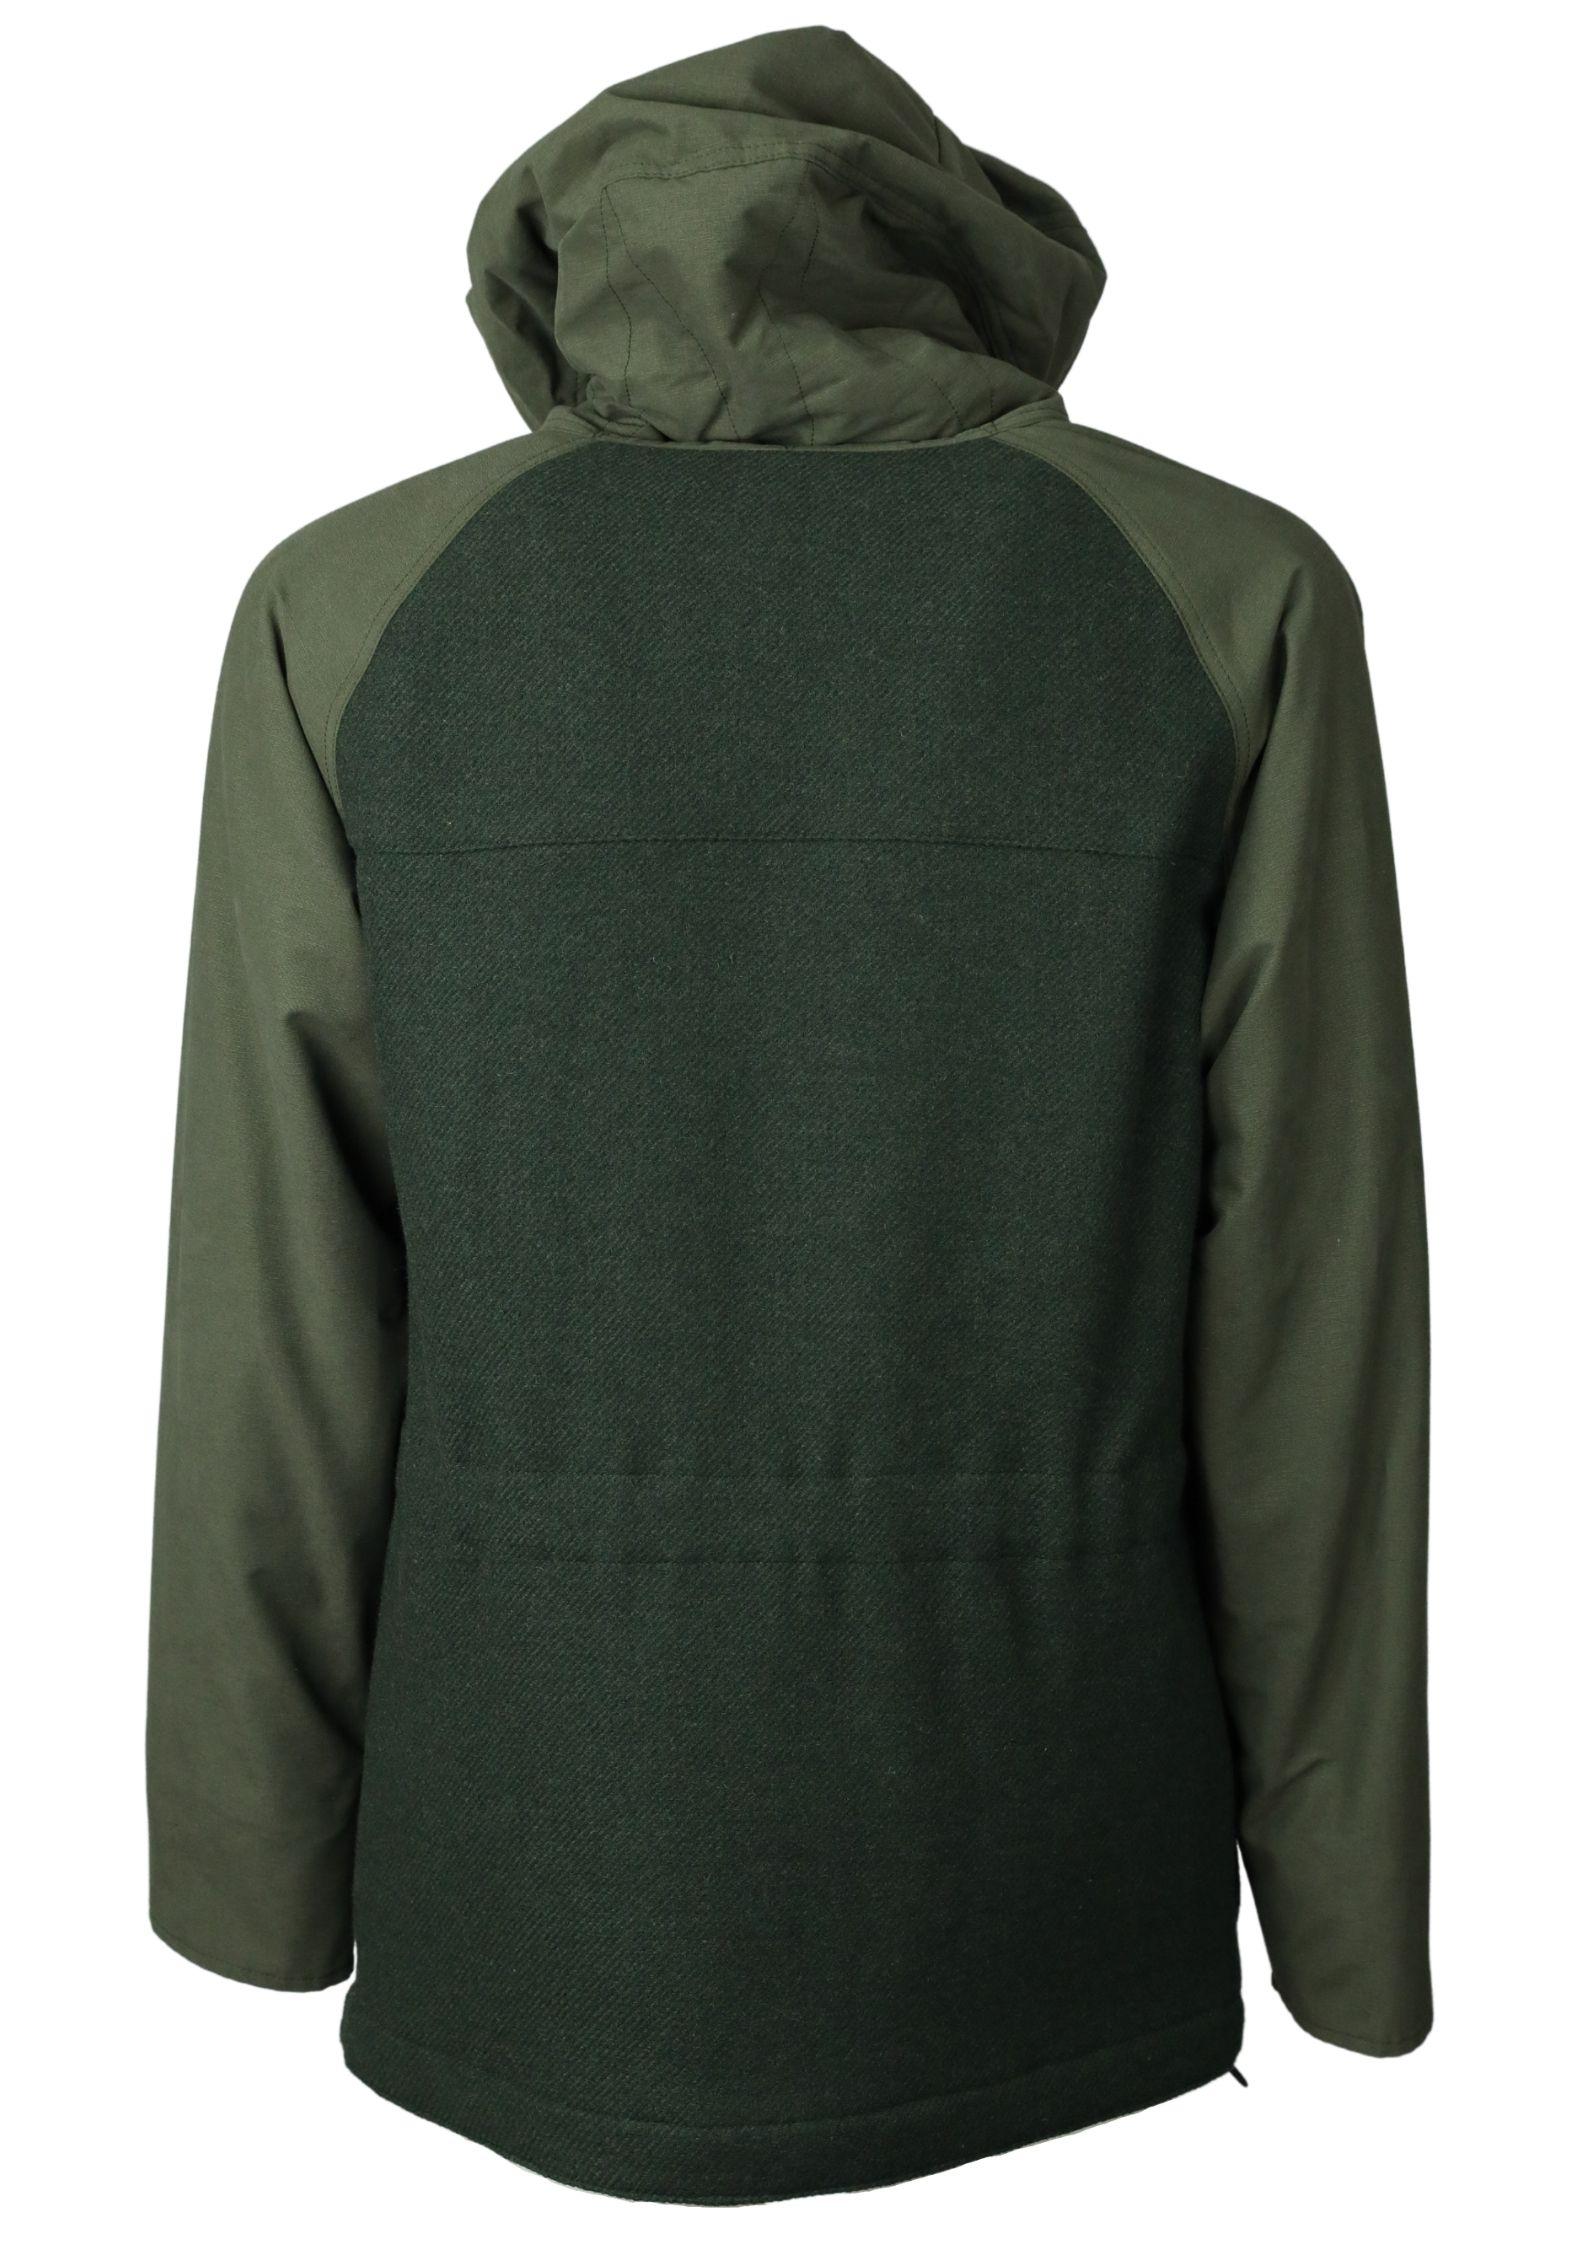 Giaccone in lana impermeabile CAMPLIN   Giacconi   ARTICVISV S